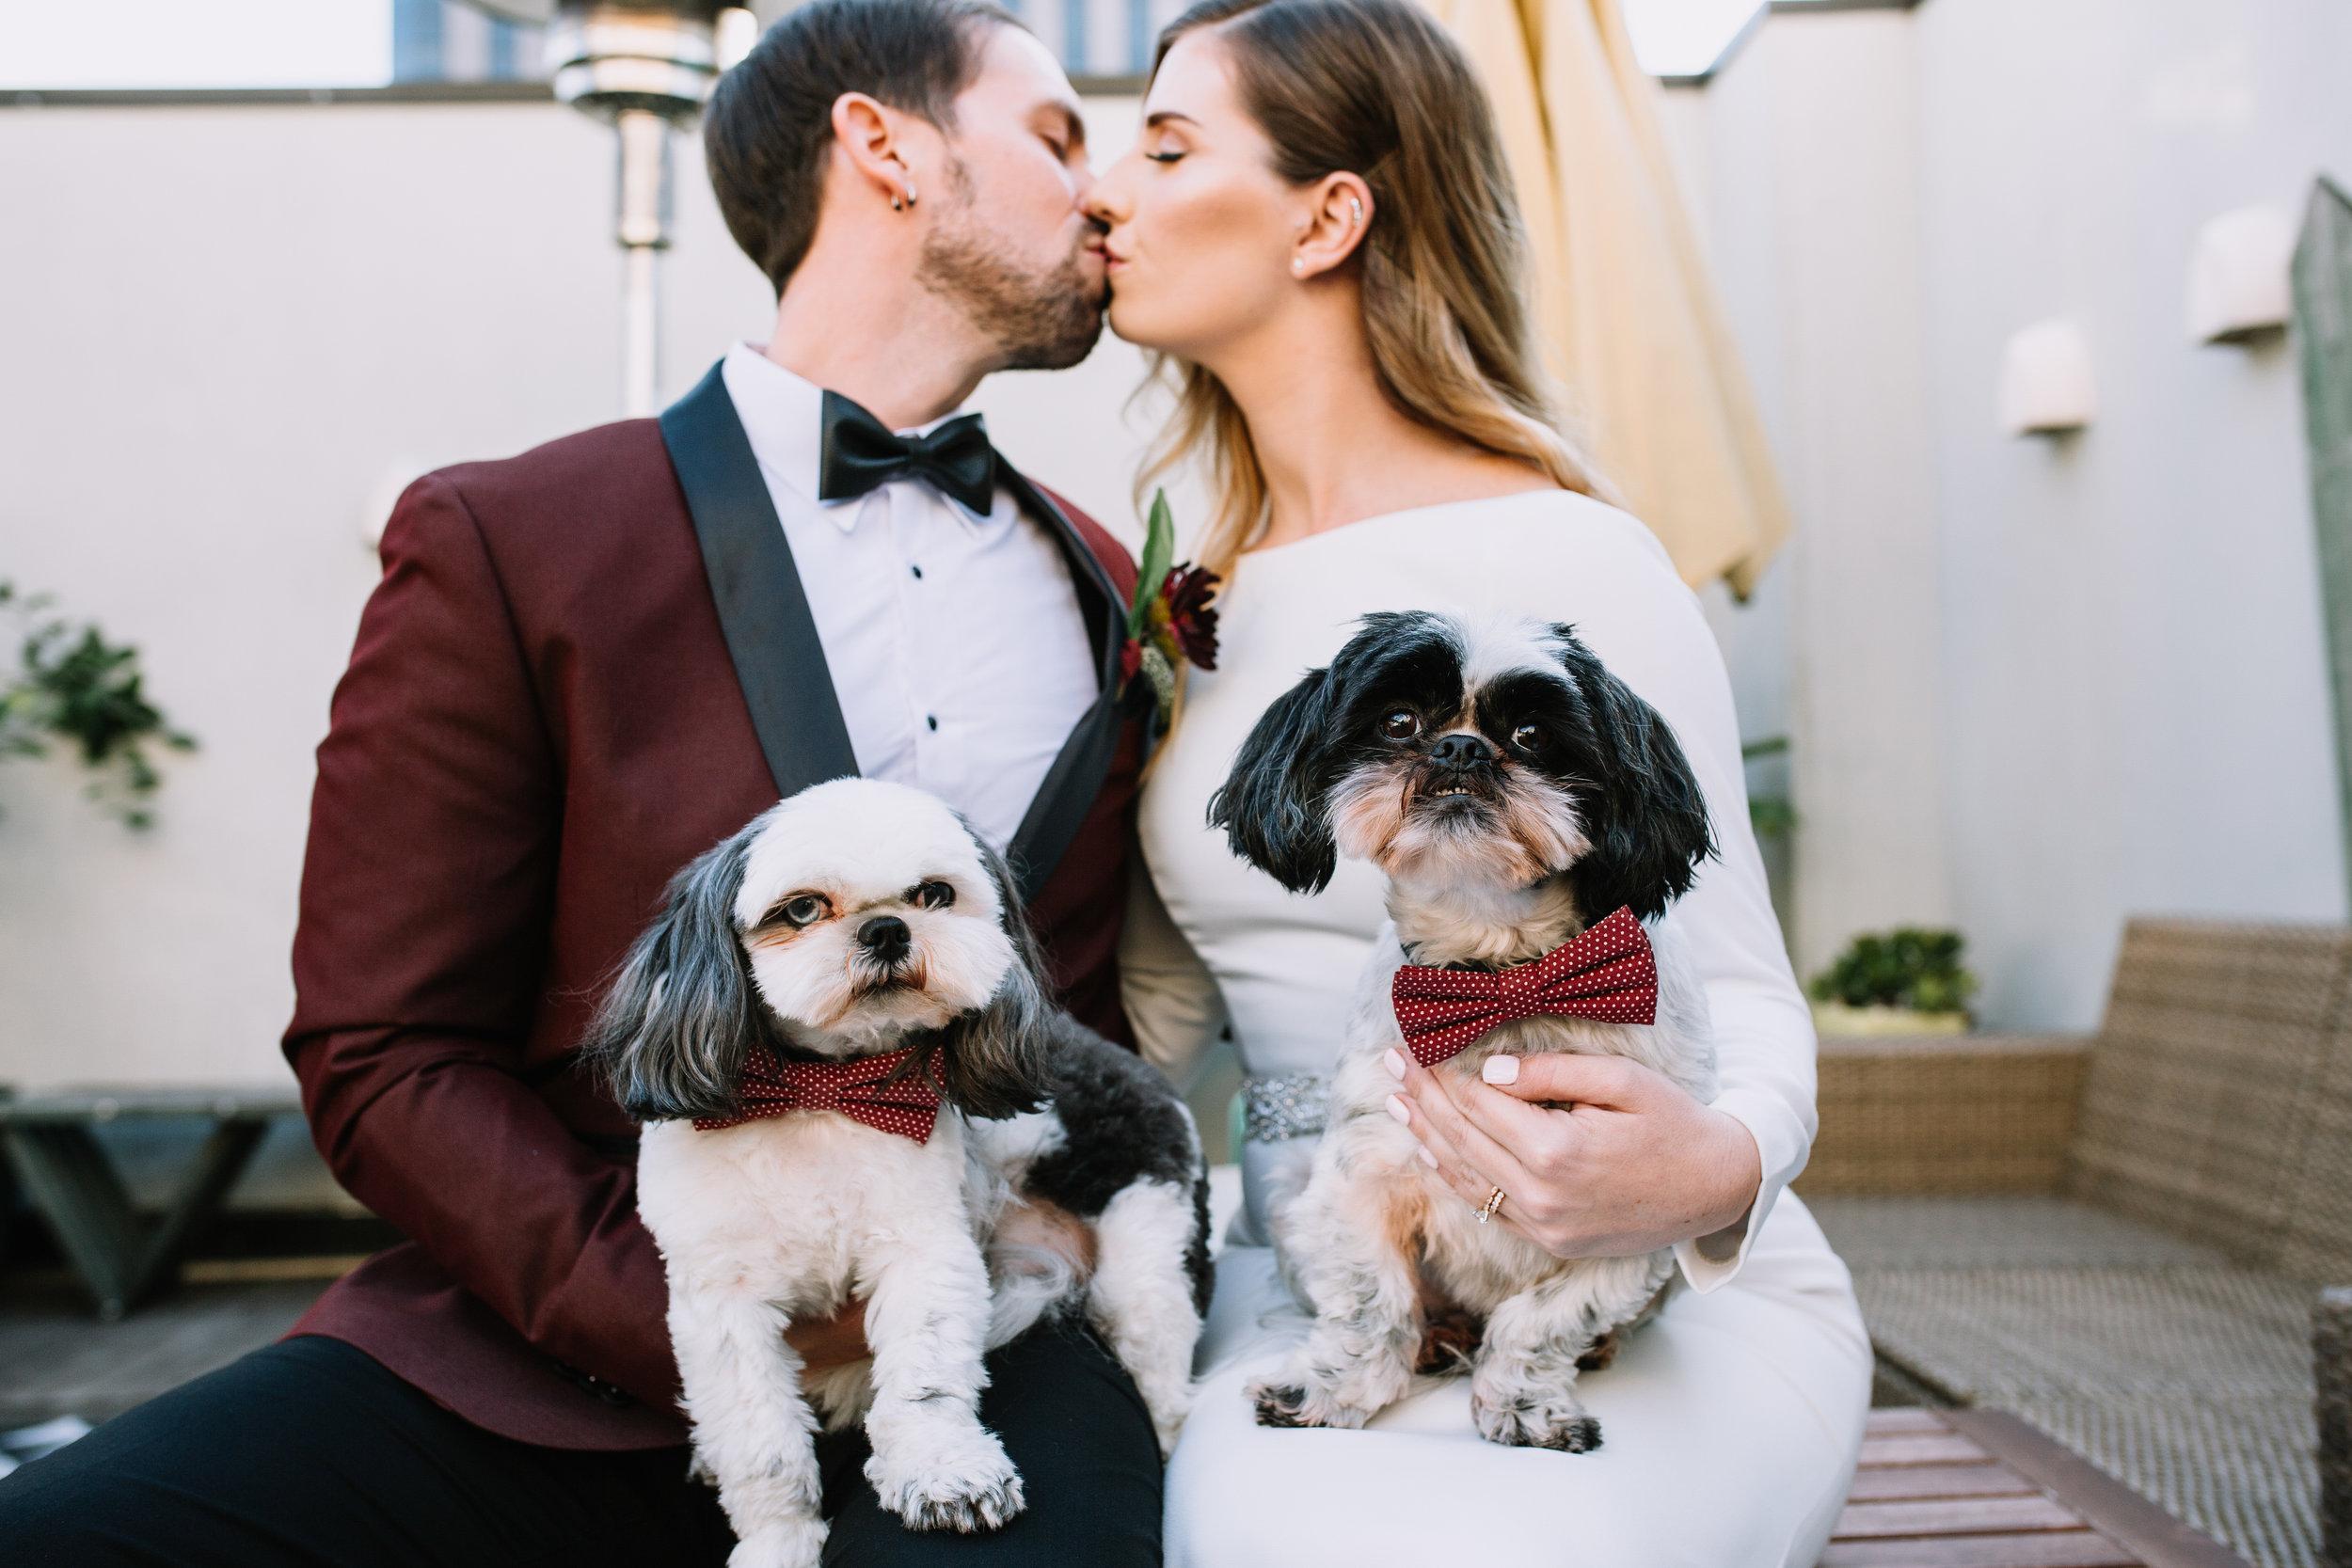 Catahoula Hotel Rooftop Wedding Ceremony New Orleans Wedding Photographer Ashley Biltz Photography7.jpg